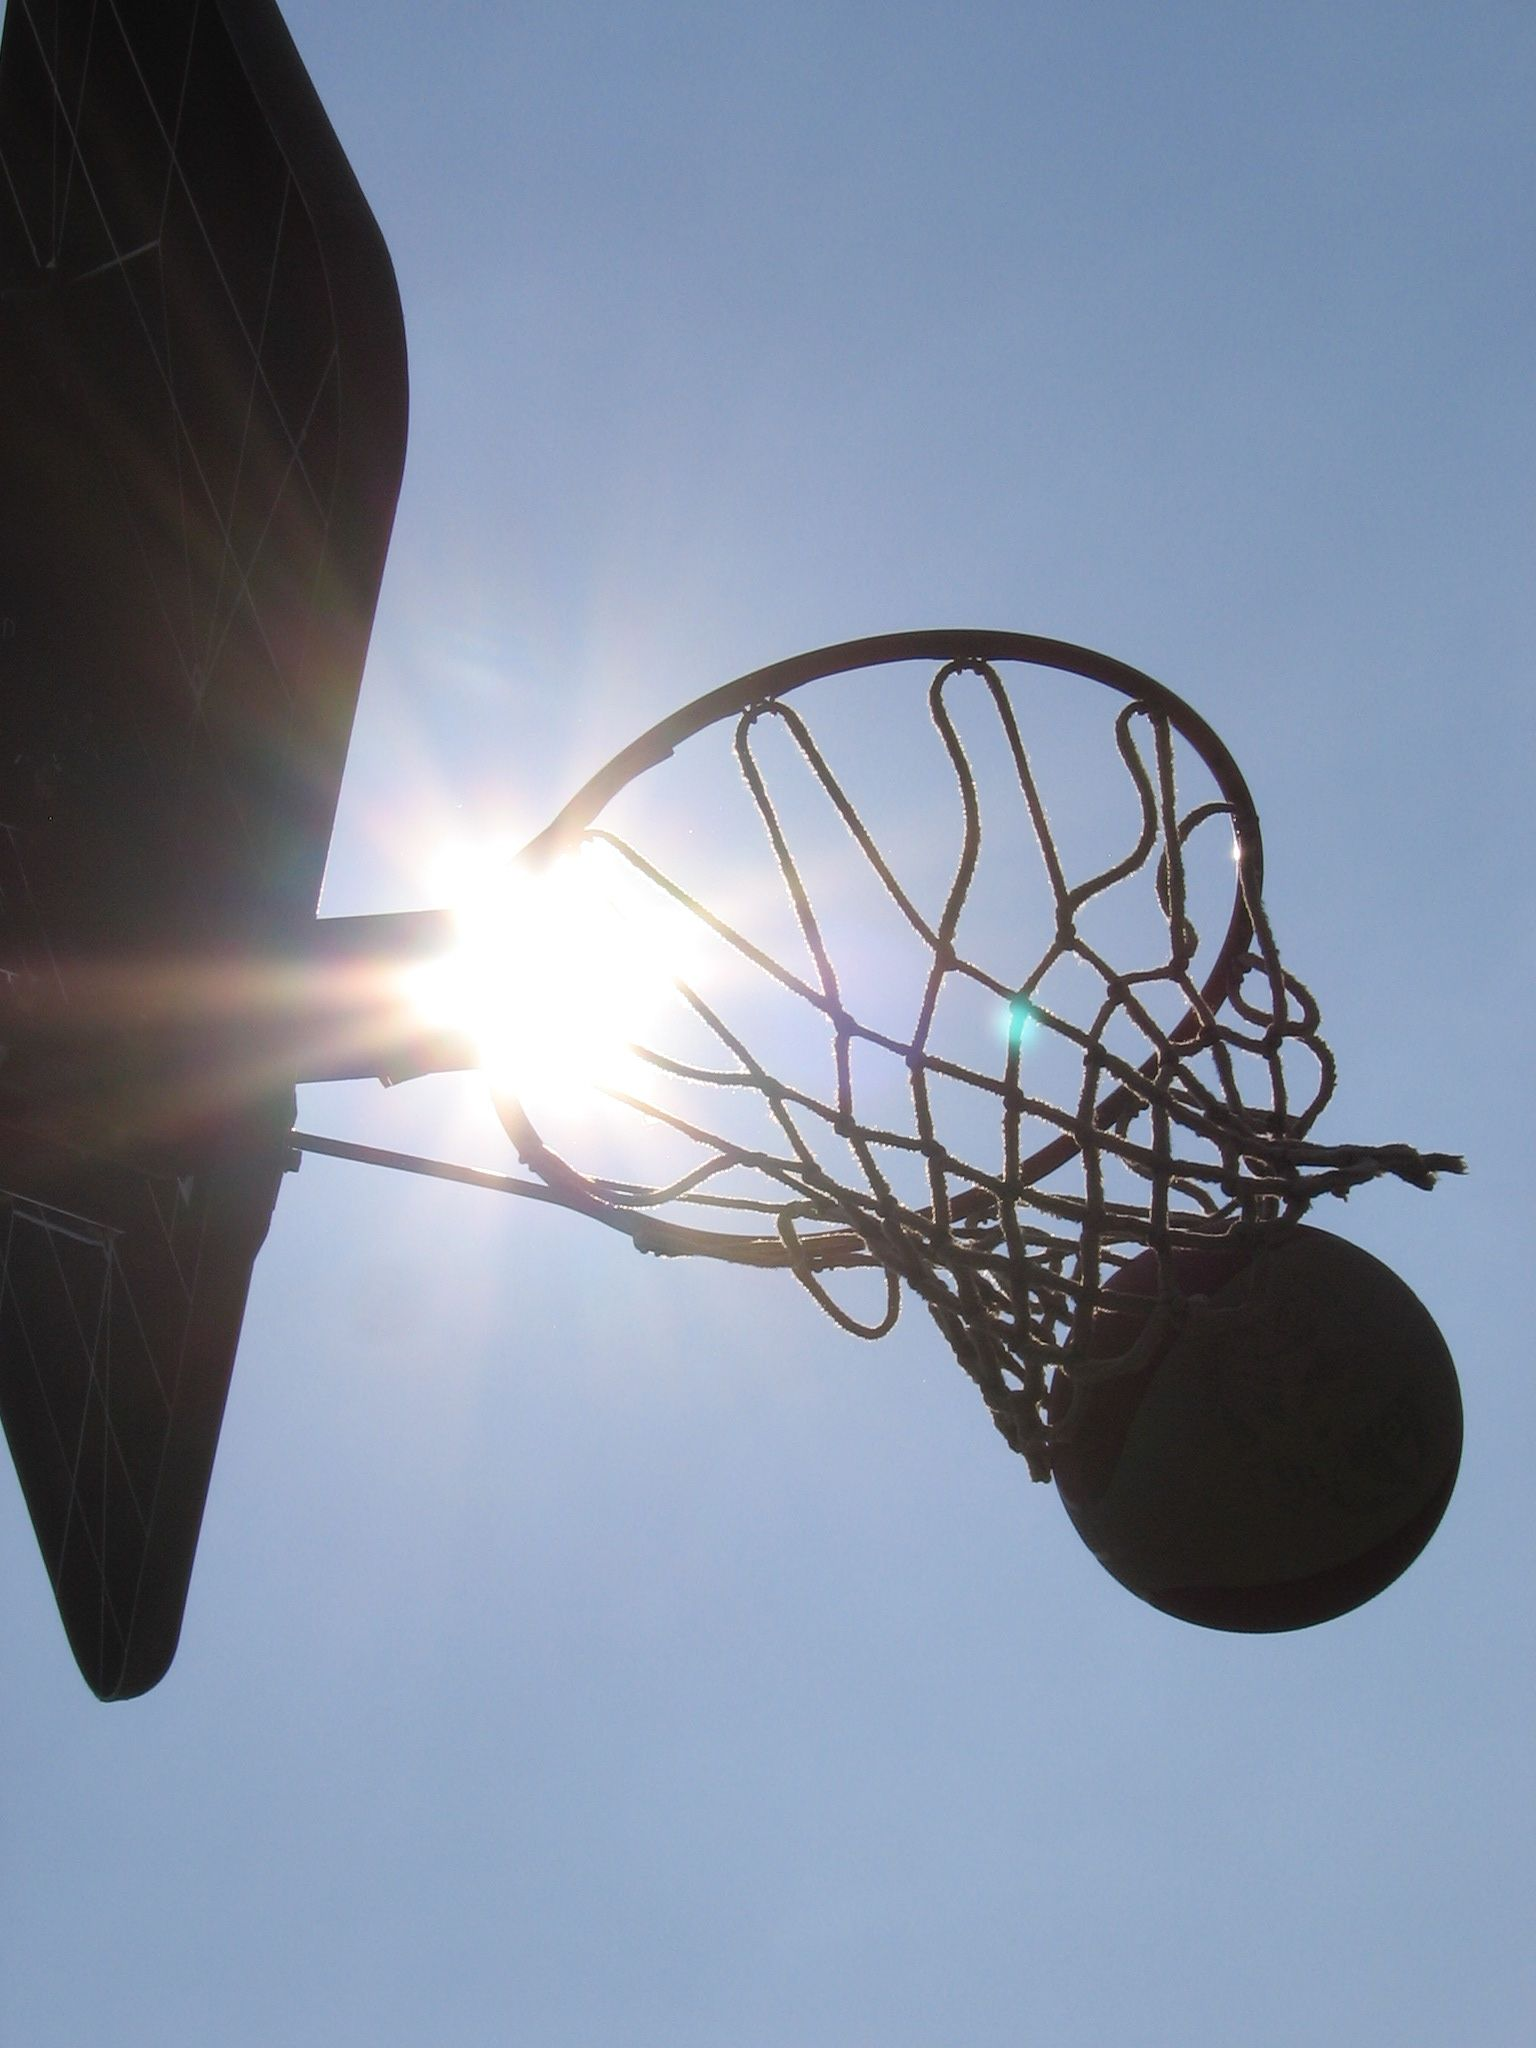 Basketball Gambar Bola Basket Bola Basket Fotografi Jalanan